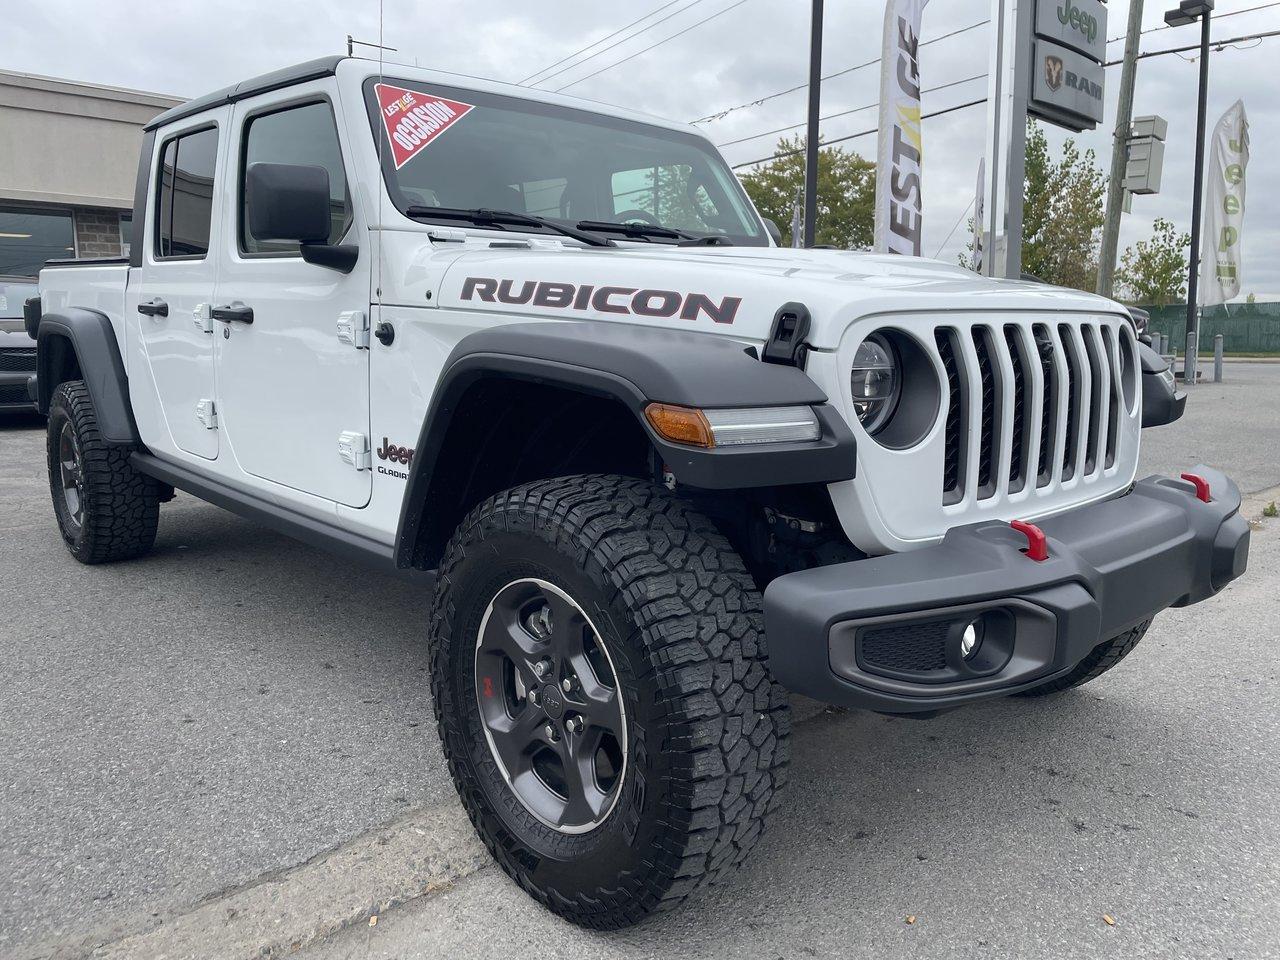 Jeep Gladiator 2020 Rubicon - Cuir - Ens. Temps froid - DEL - GPS